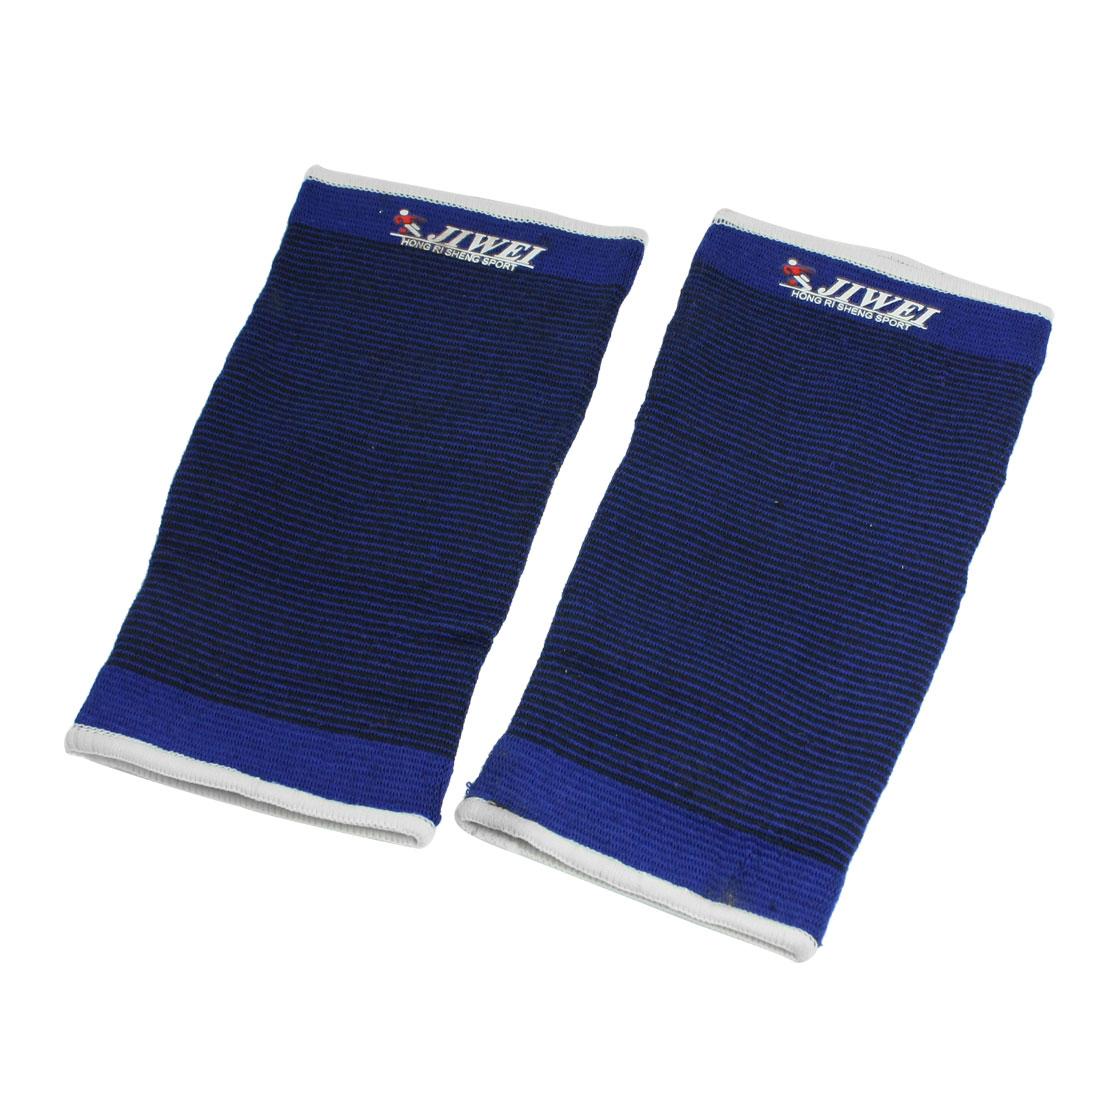 2 Pcs Sports Black Blue Pinstriped Elastic Crus Calf Support Sleeve